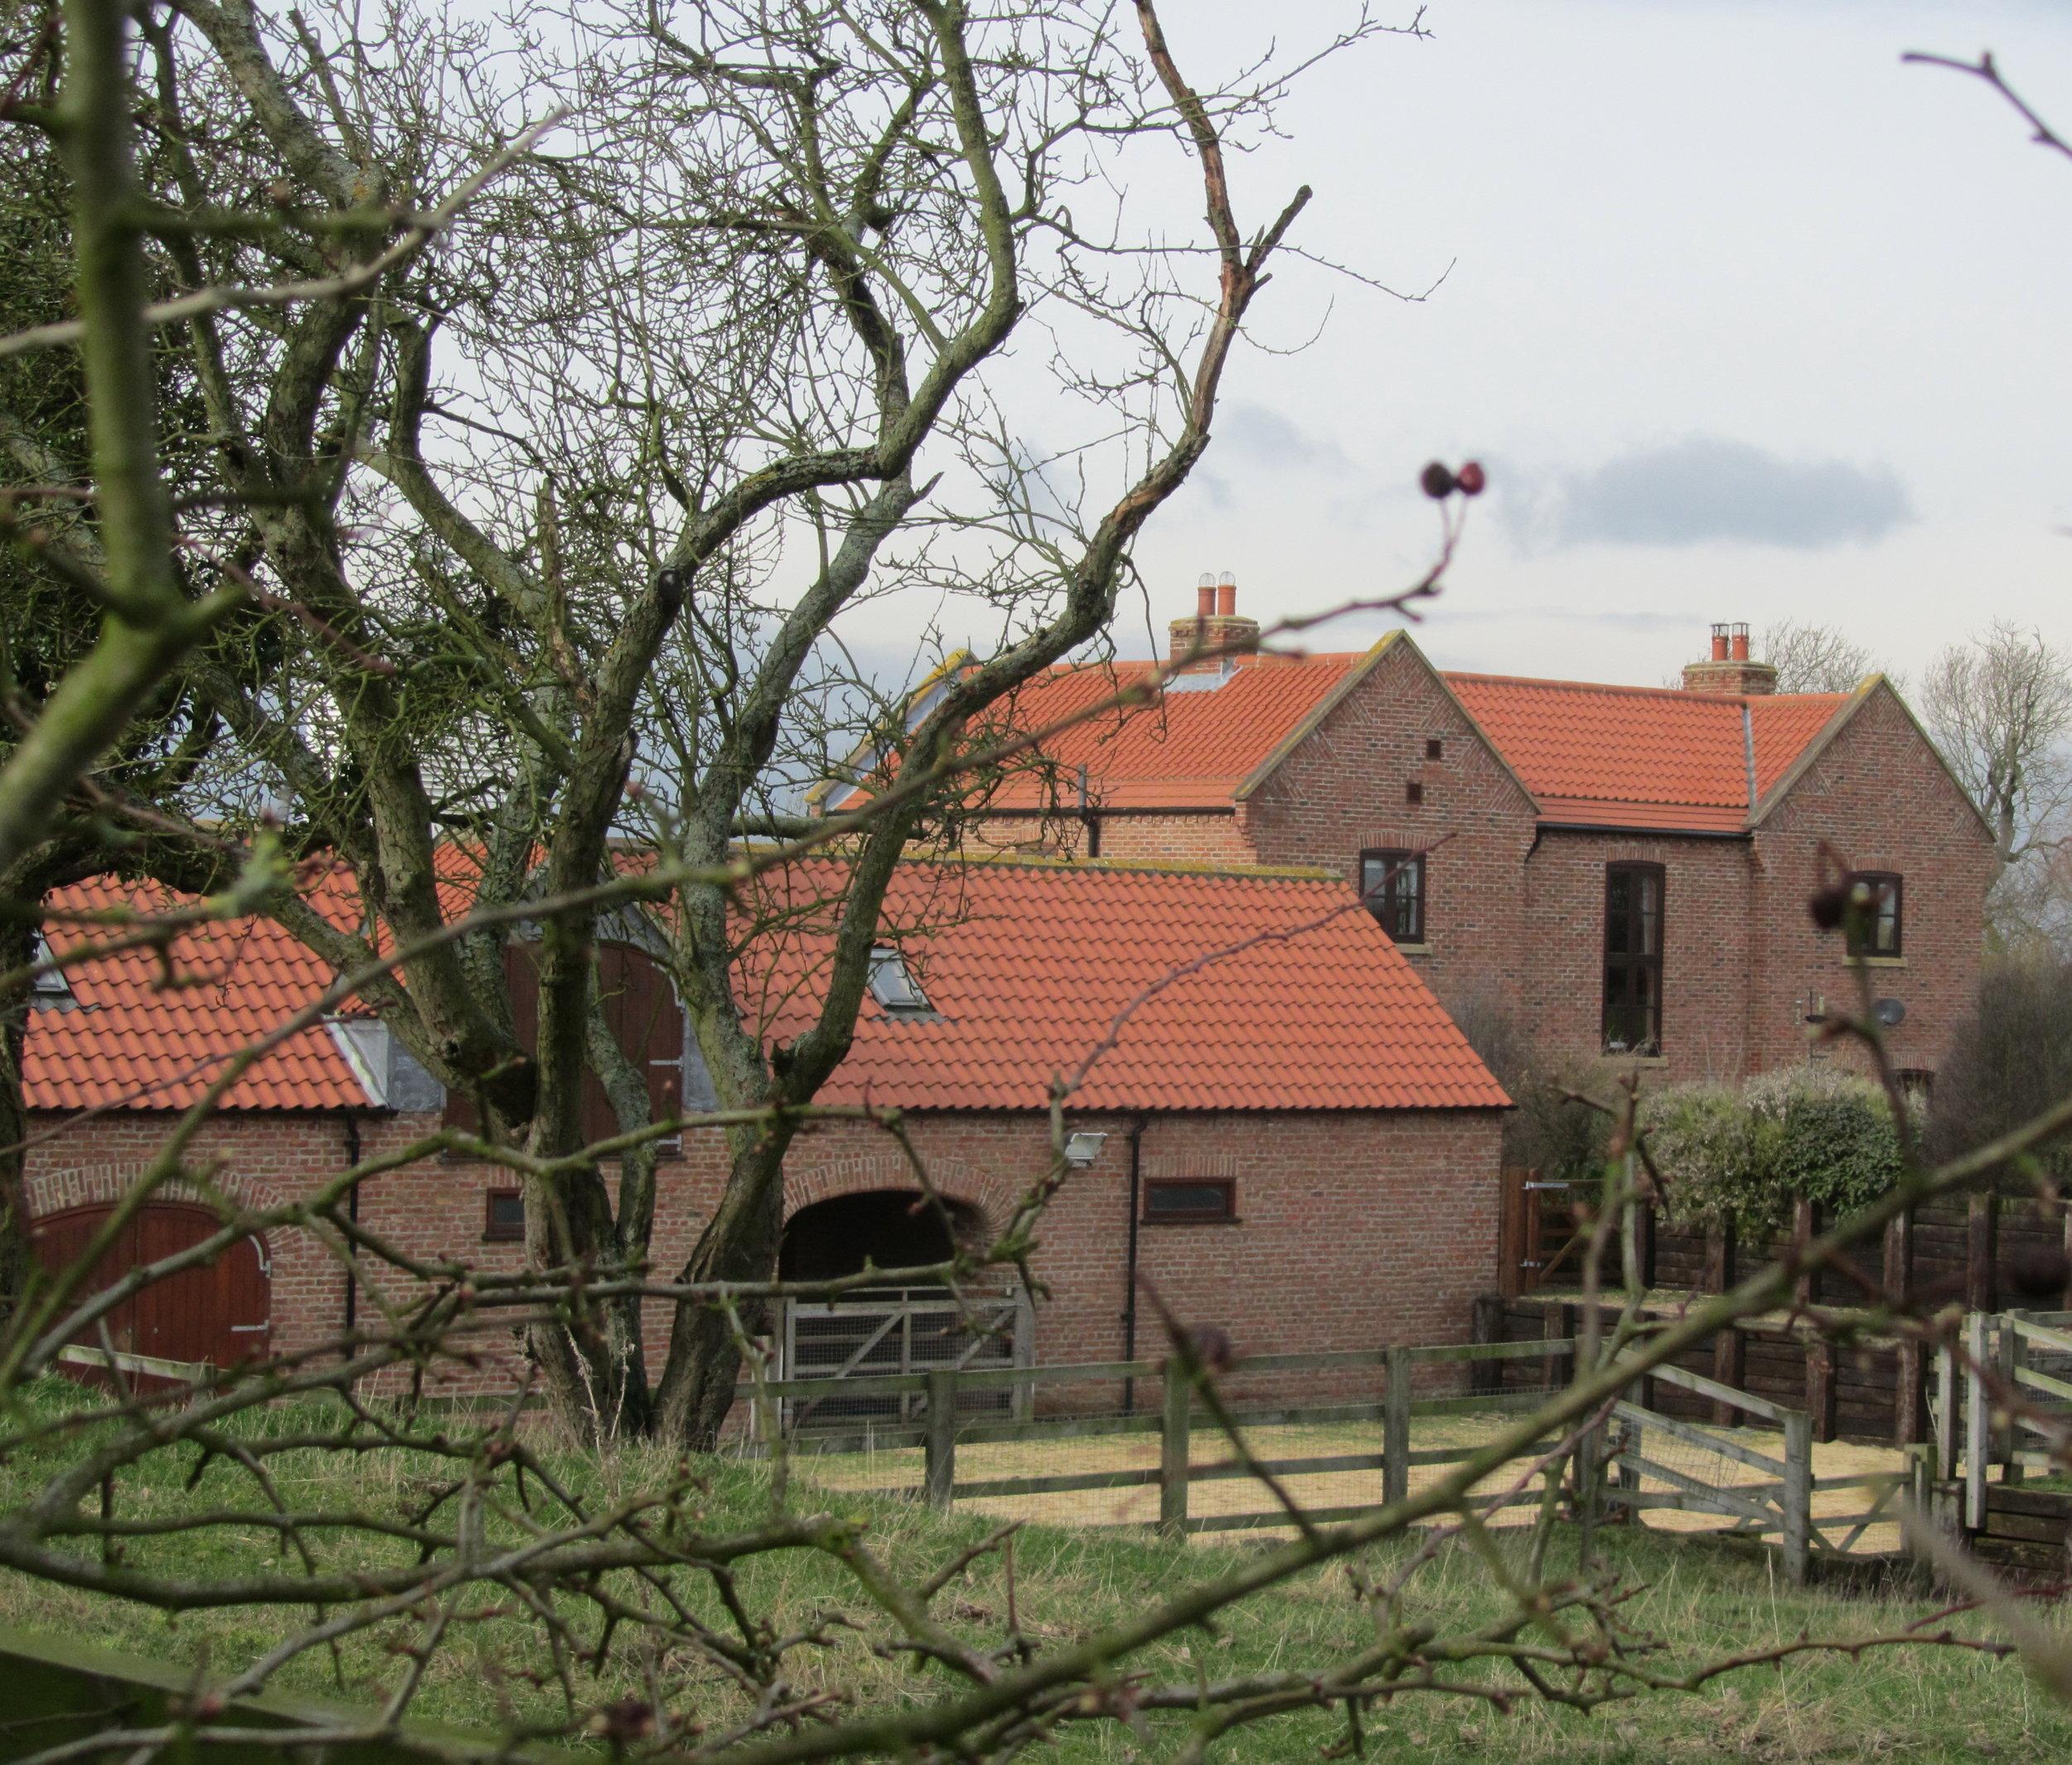 Exterior 2 - North End Farm - East Yorkshire Architects - Samuel Kendall Associates